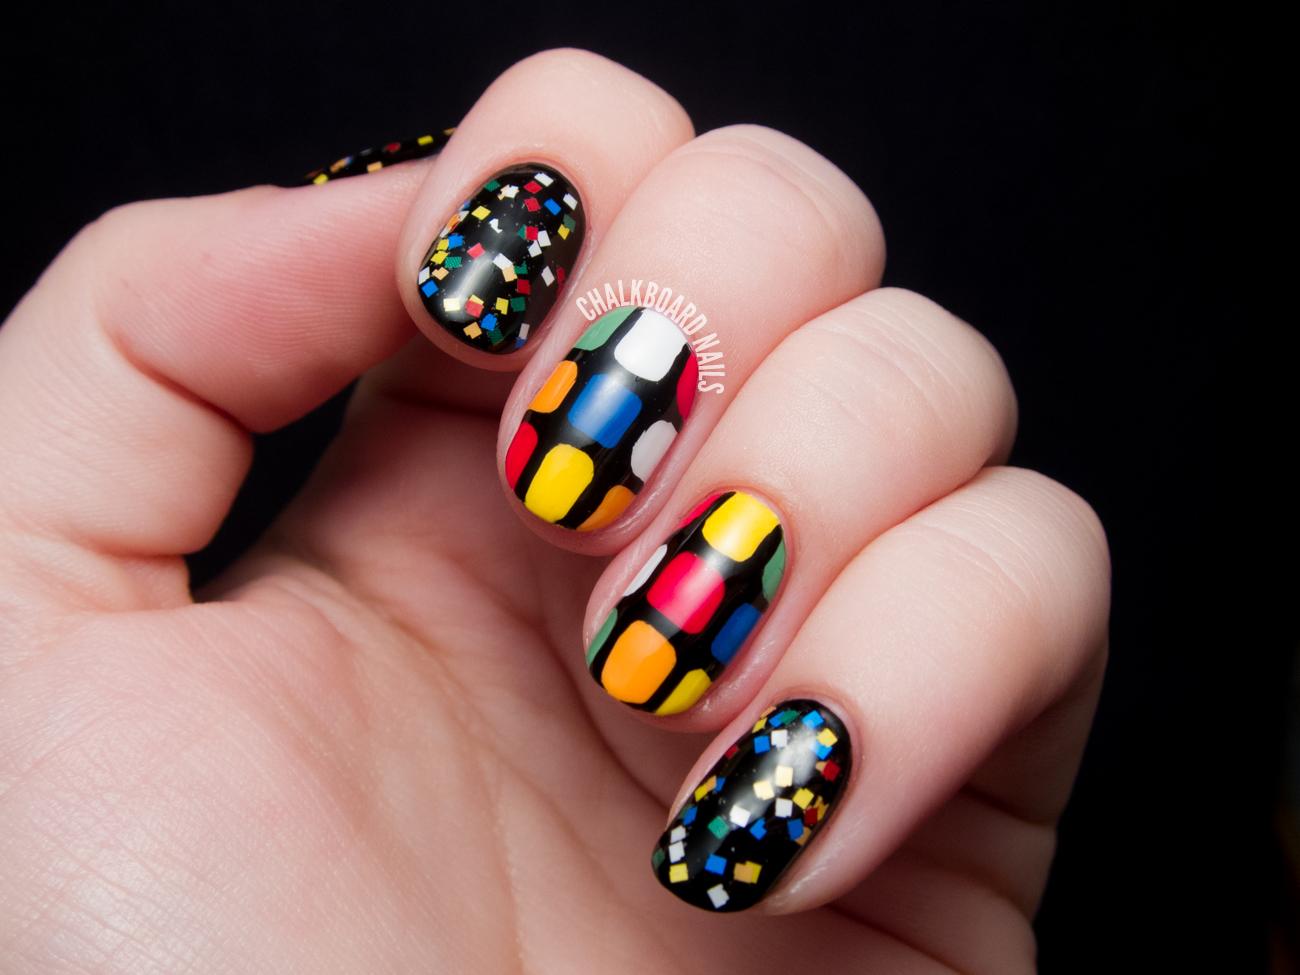 Rubiks Cube Nail Art Chalkboard Nails Nail Art Blog